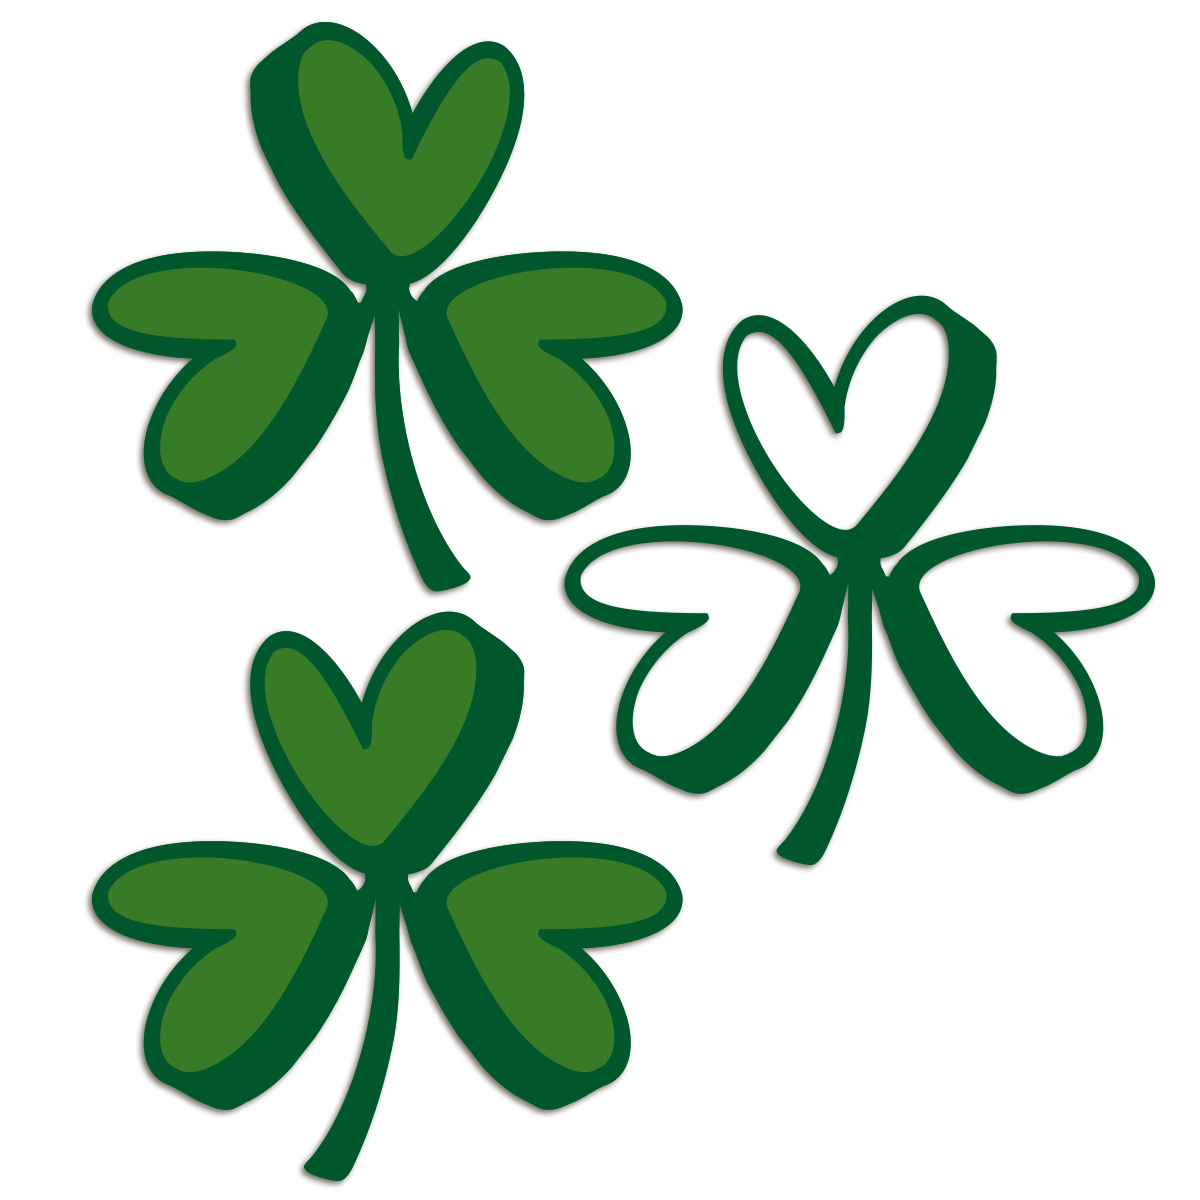 1200x1200 Bits Of Paper St. Patrick's Day